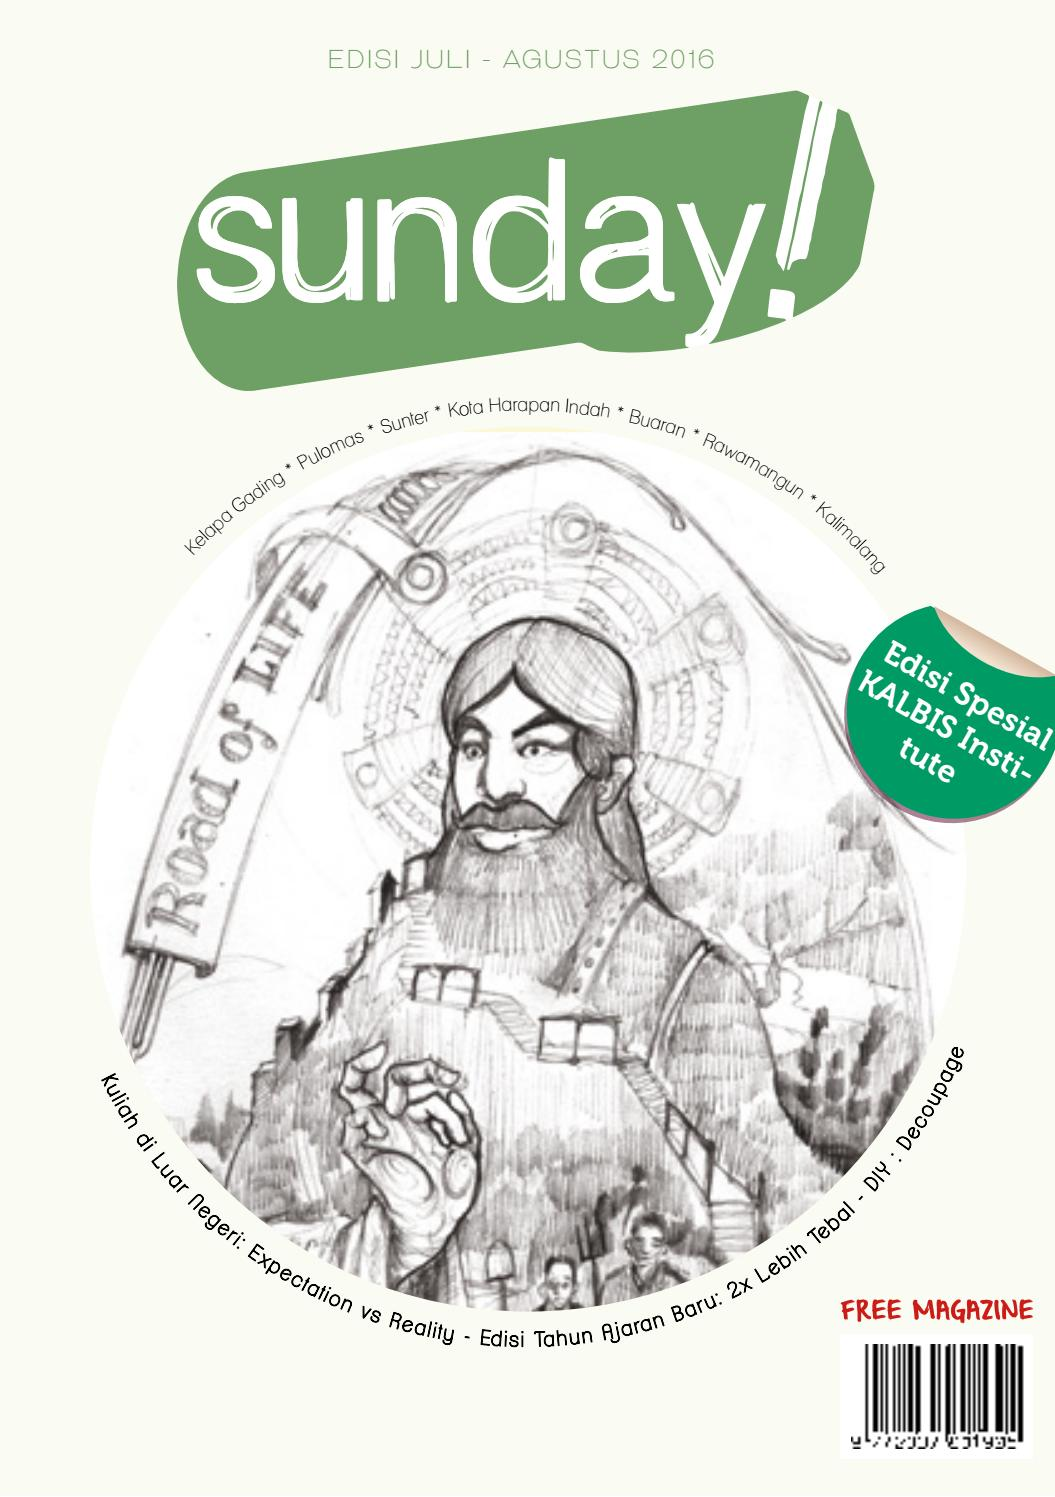 Sunday Kalbis Special By Majalah Issuu Produk Ukm Bumn Kotak Tisu Pandan Decopage